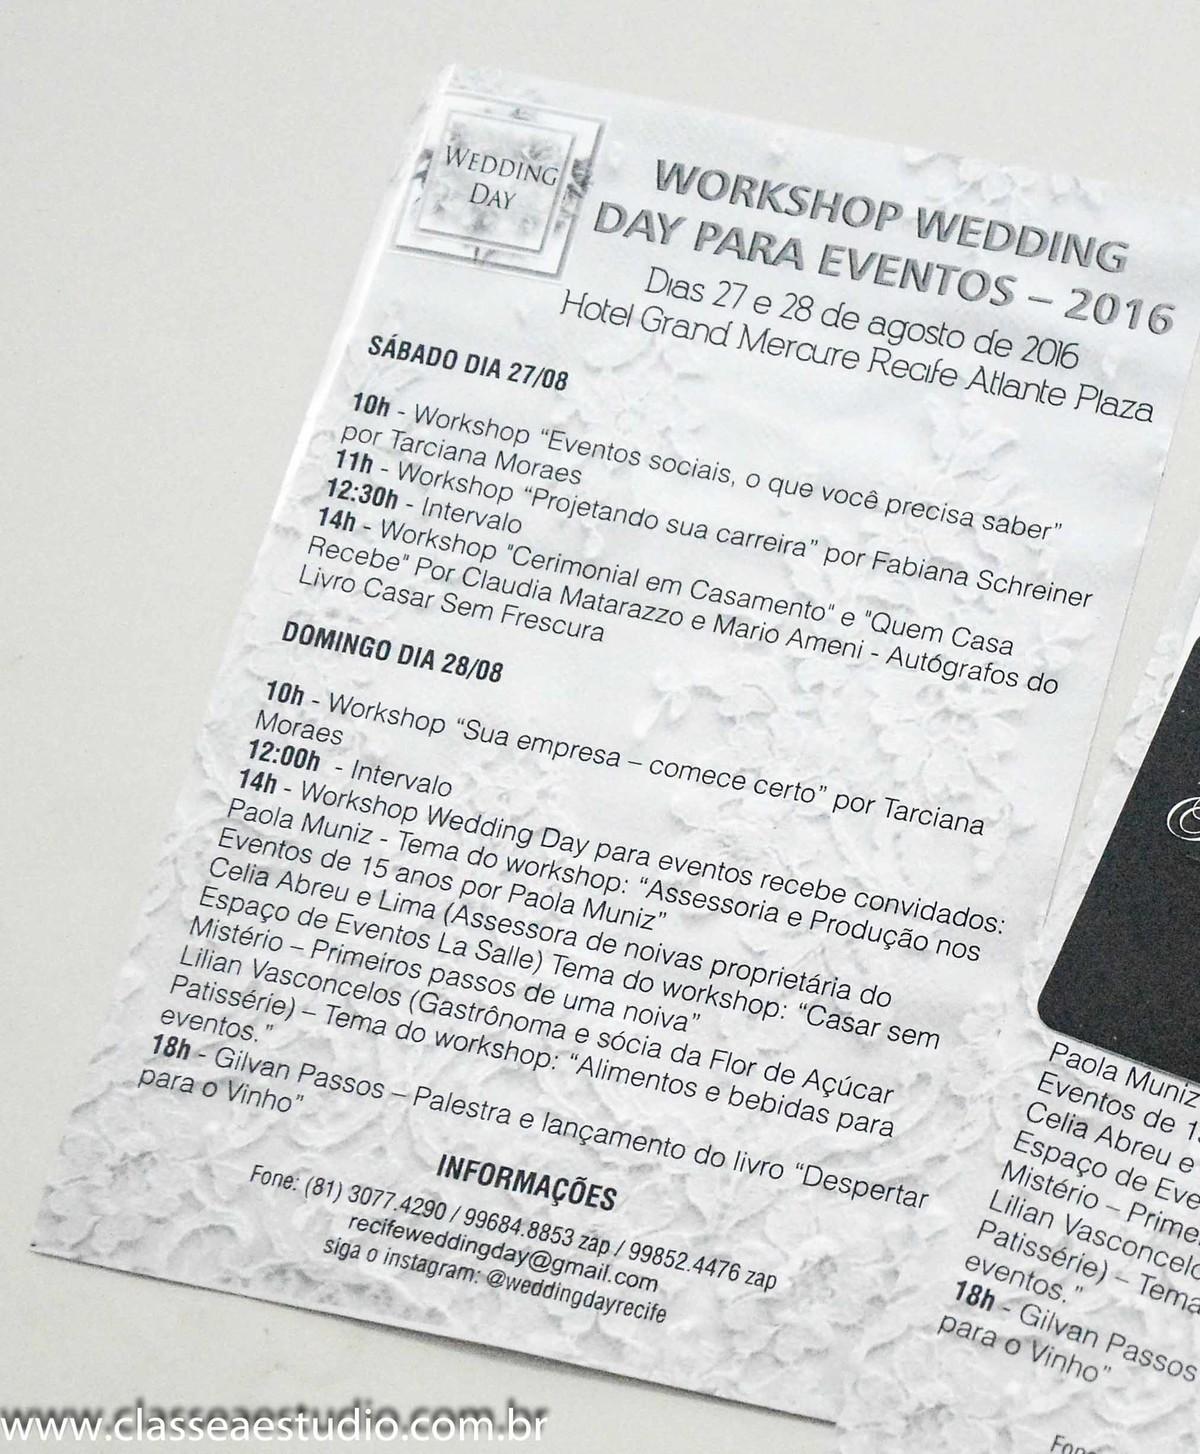 workshop wedding day